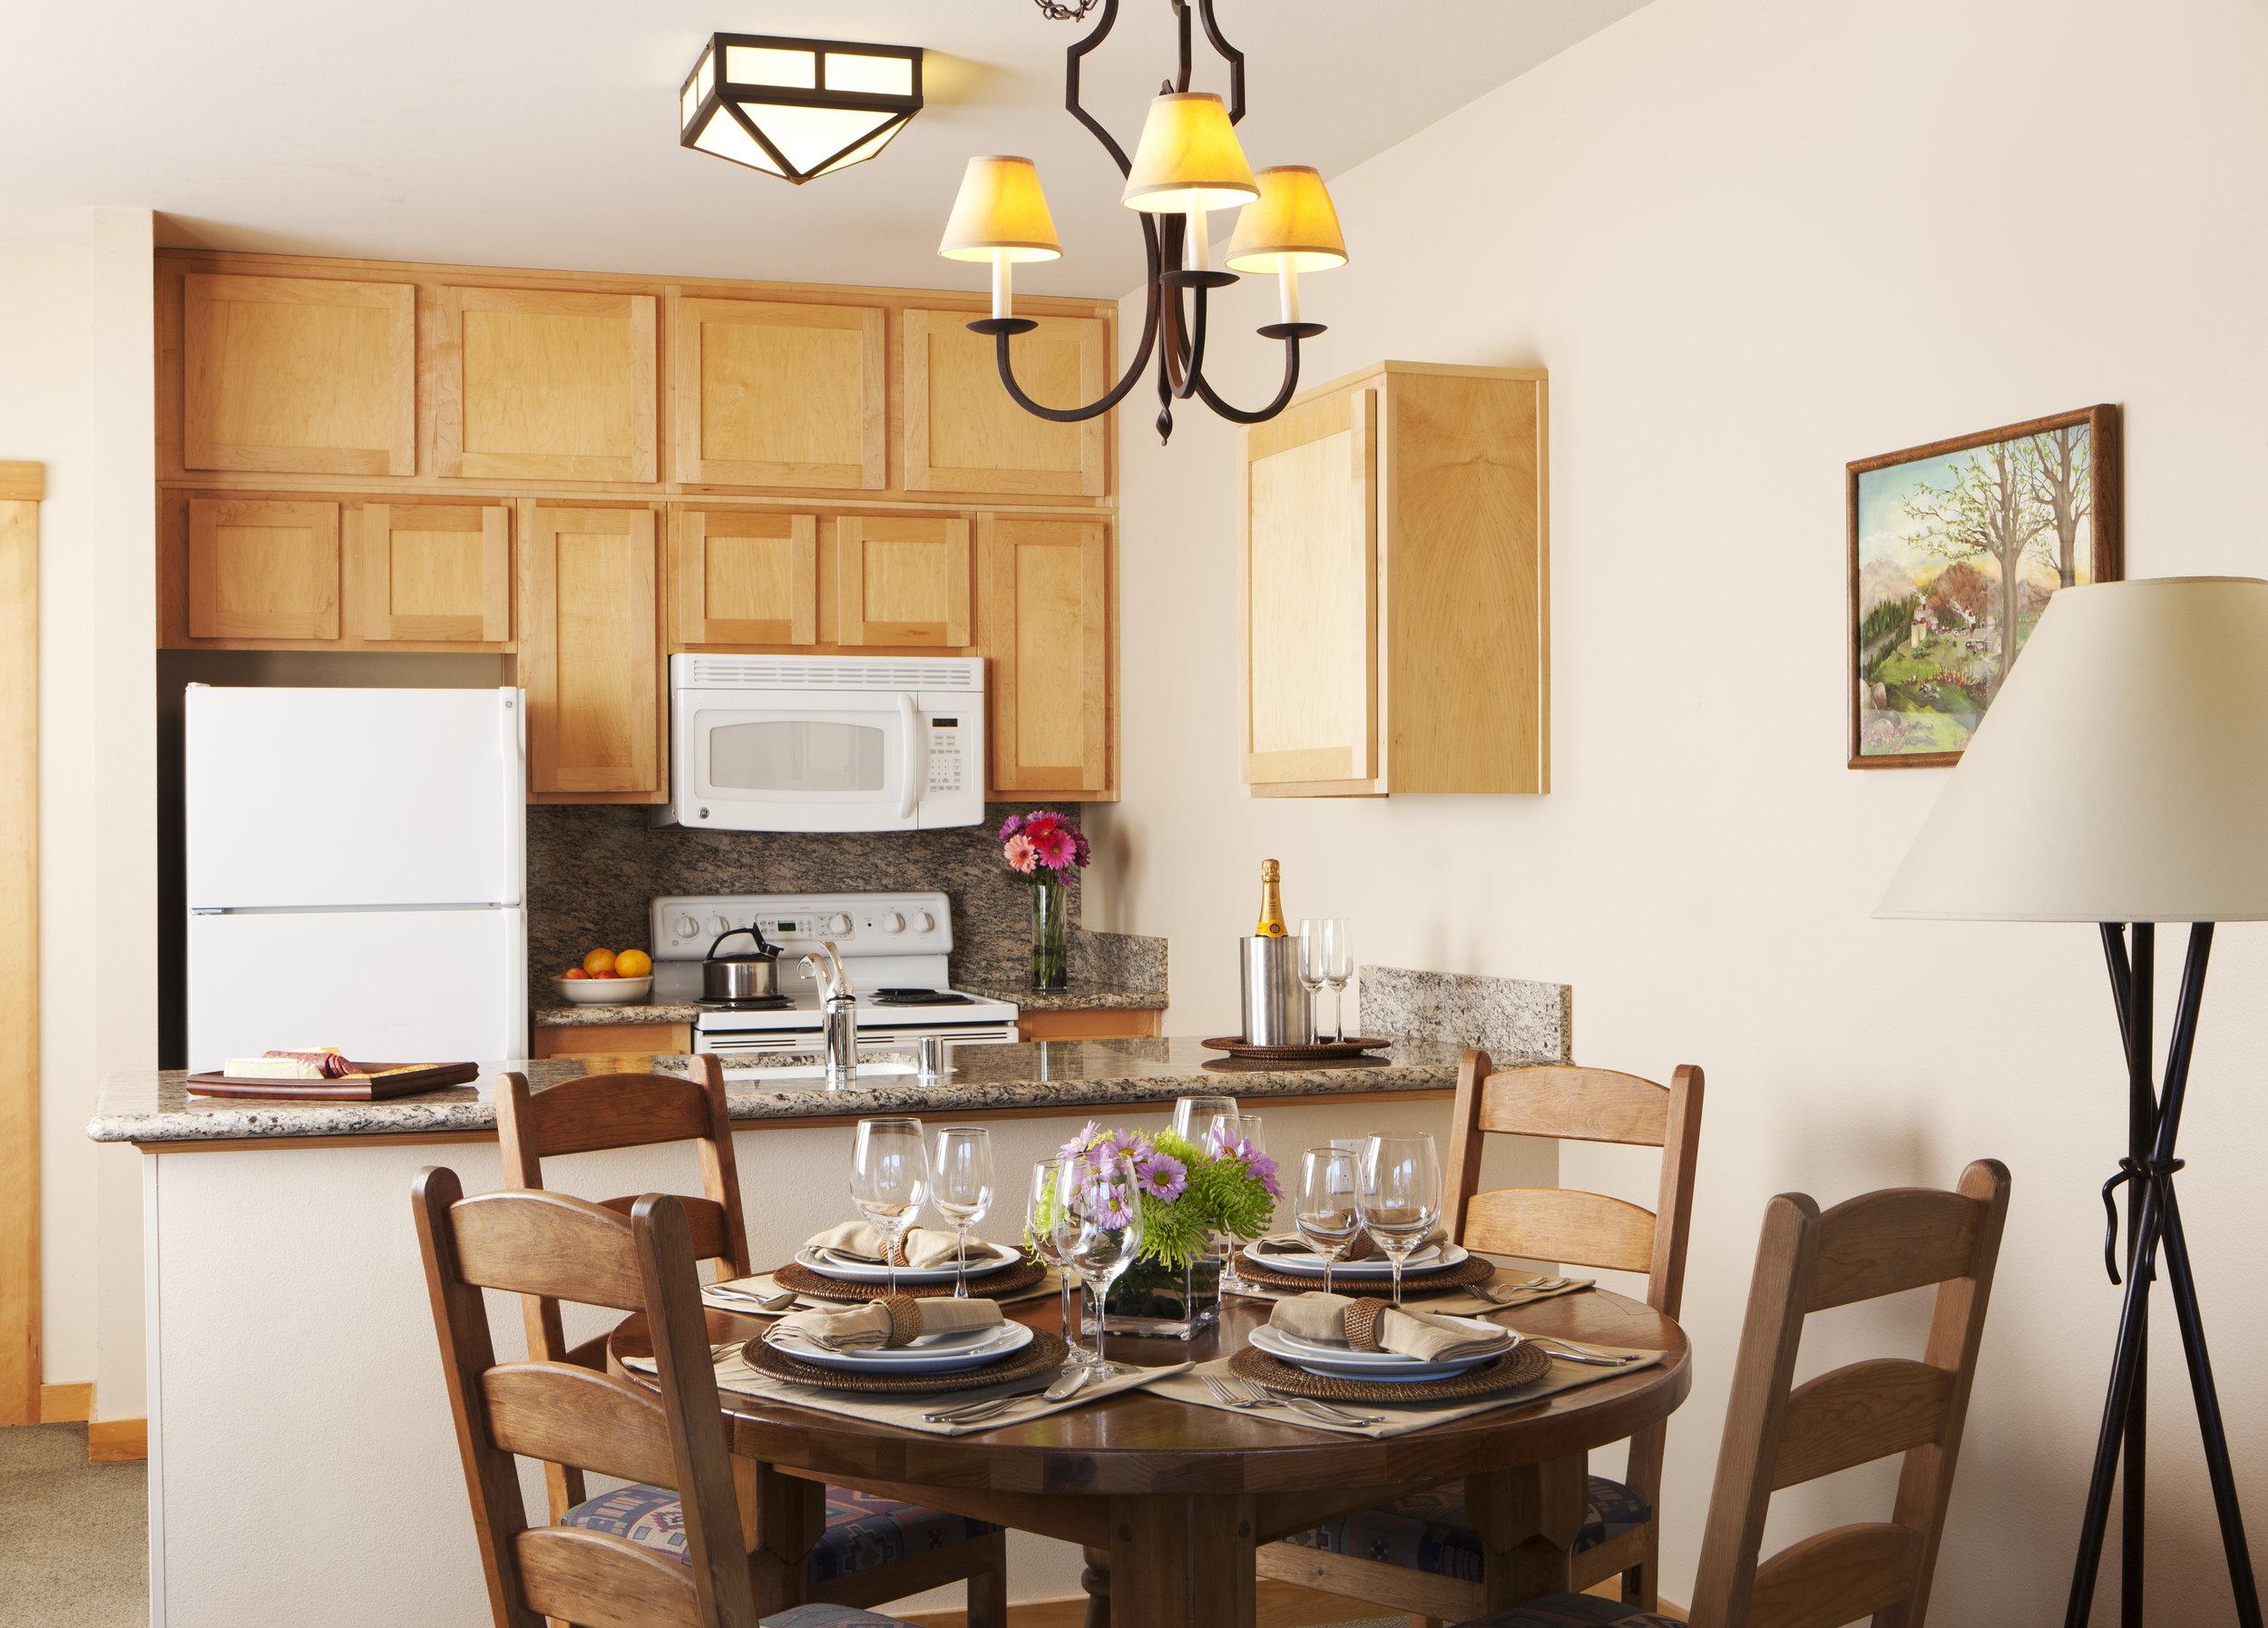 One Bedroom Condominium J1C1K4 - Dining Area.jpg